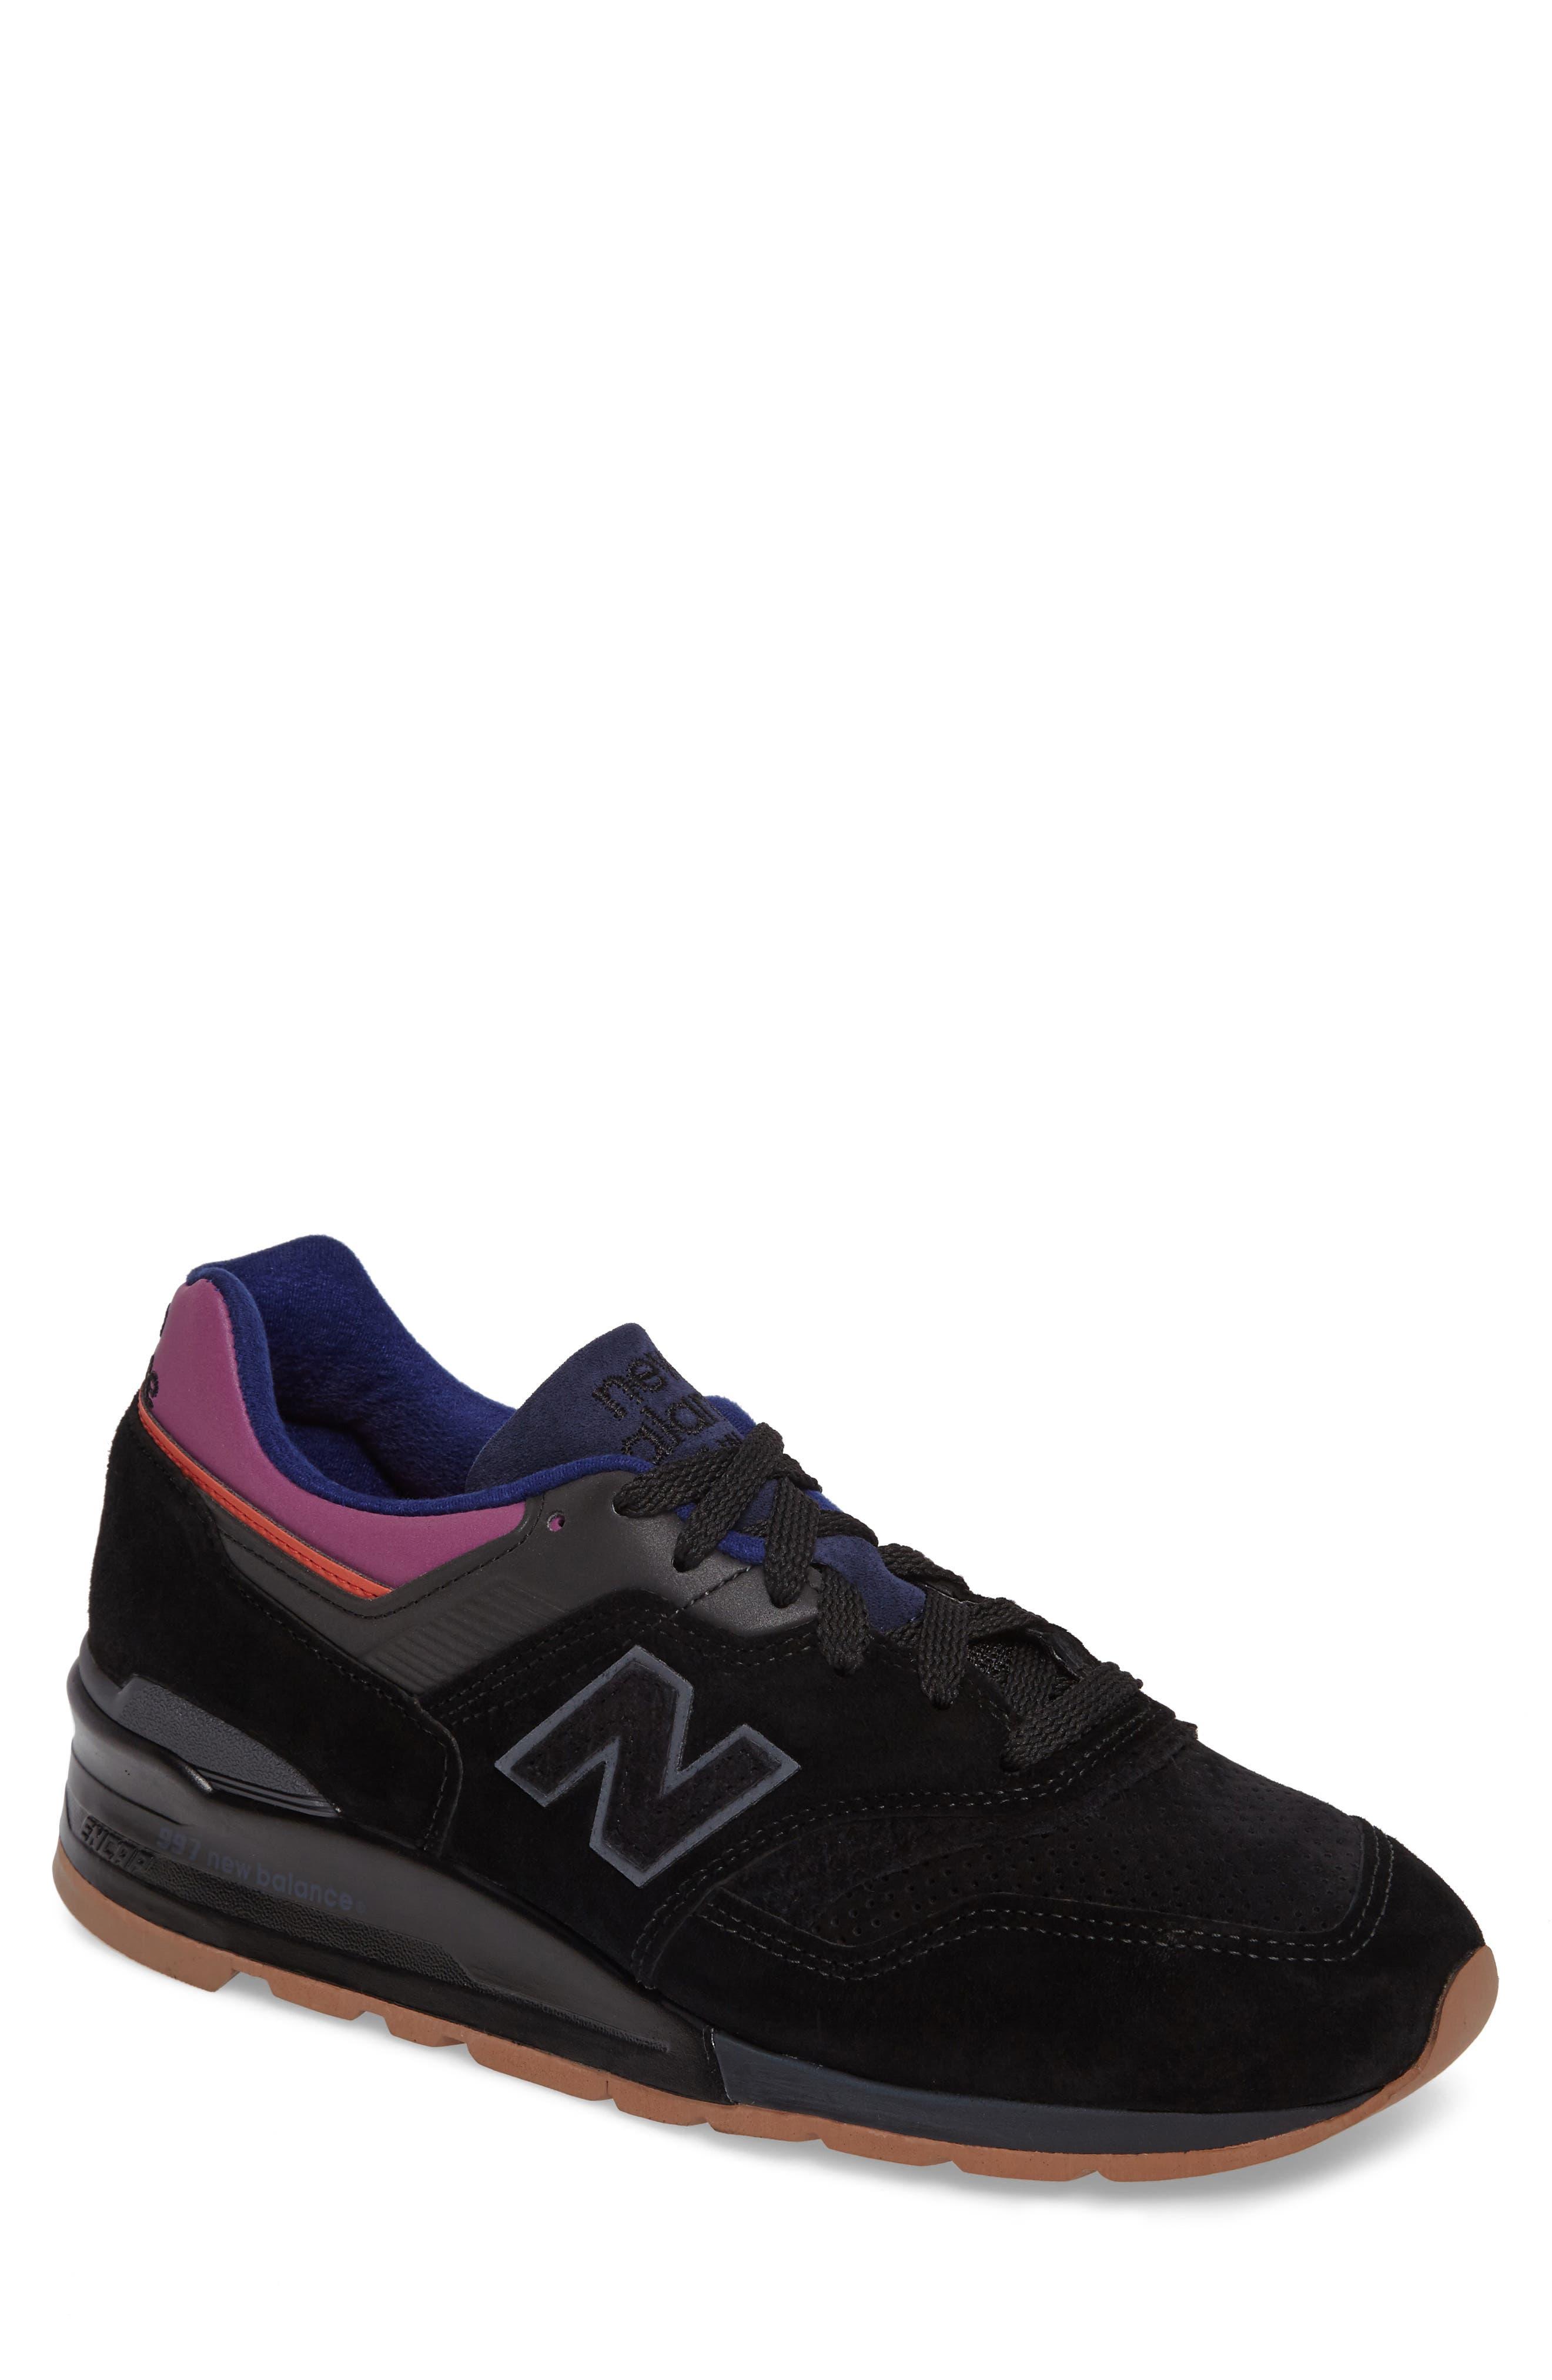 997 Sneaker,                             Main thumbnail 1, color,                             001